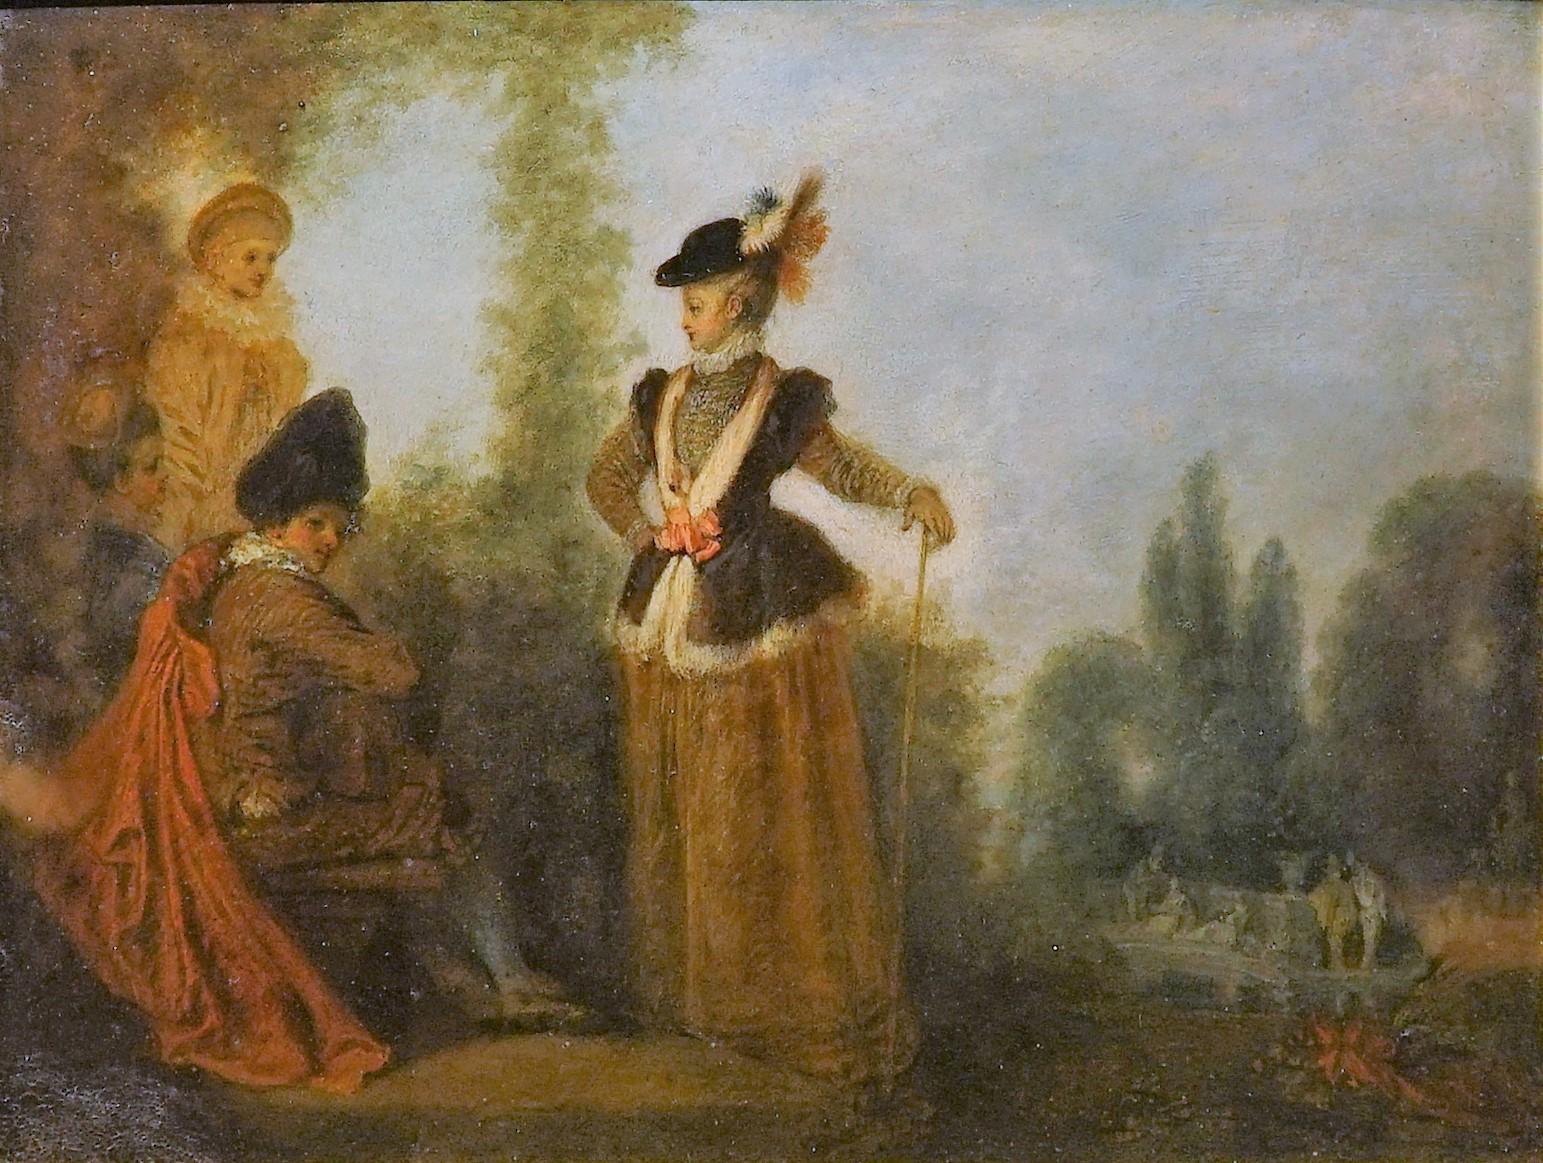 Watteau 1710-16 L'aventuriere Musee des Beaux Arts Troyes